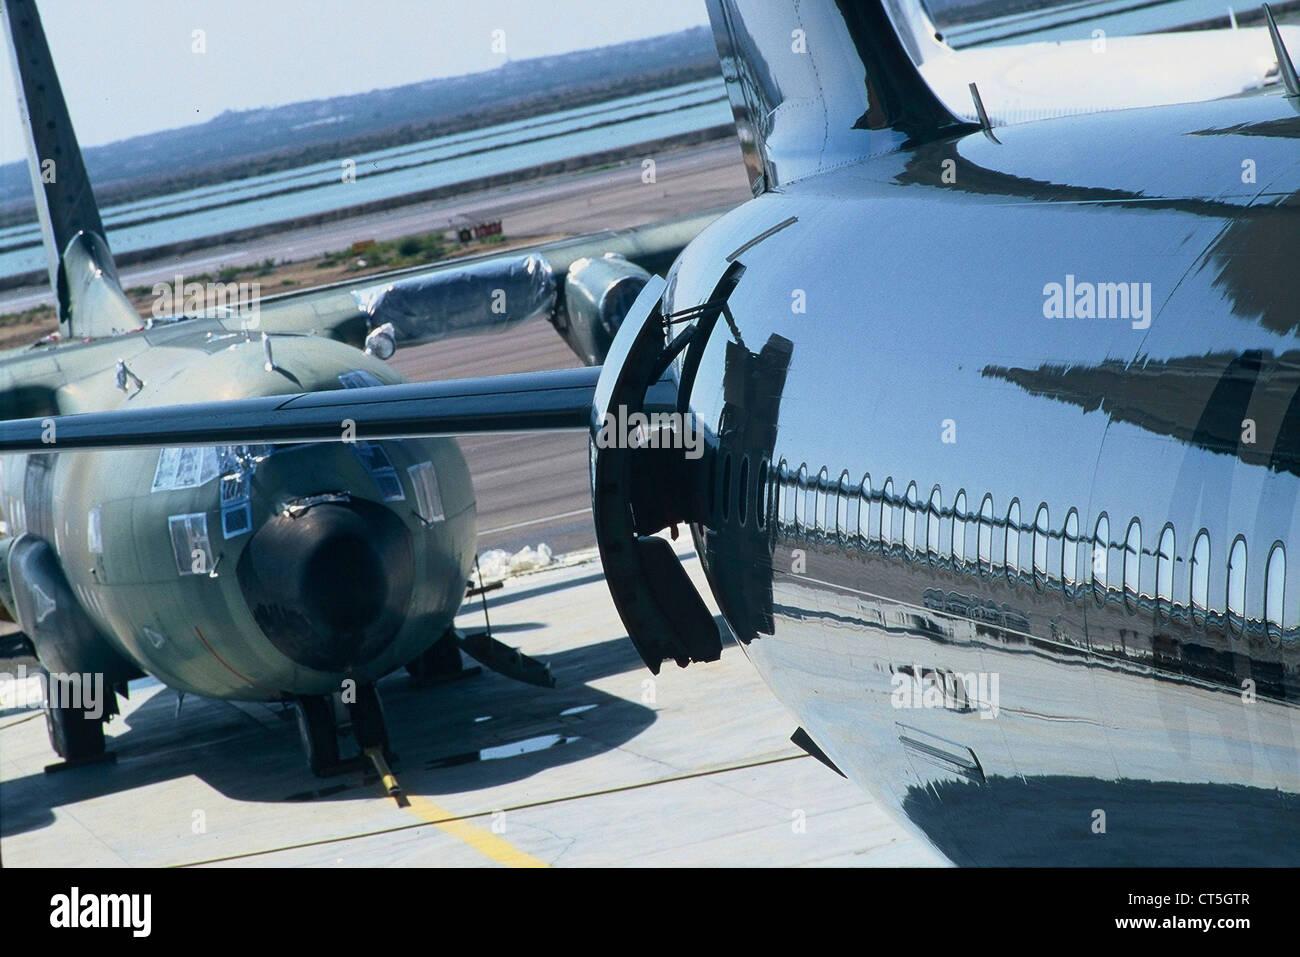 AERONAUTICS INDUSTRY - Stock Image